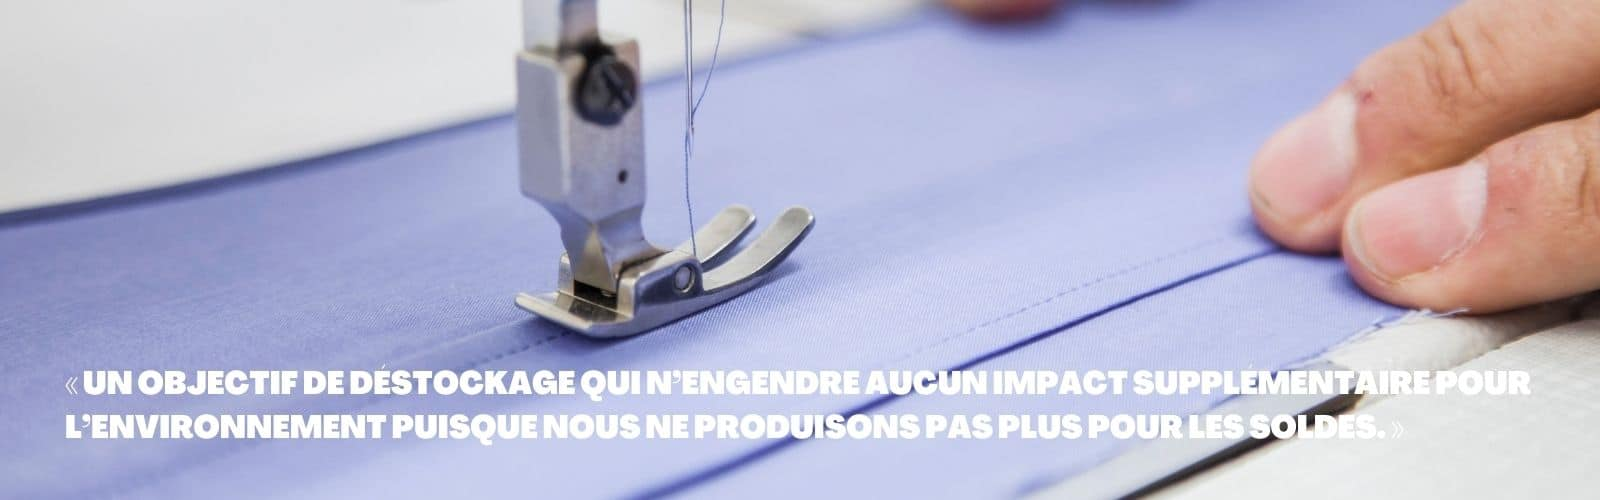 sans-impact-supplémentaire-pour-environnement-tranquille-emile-made-in-france